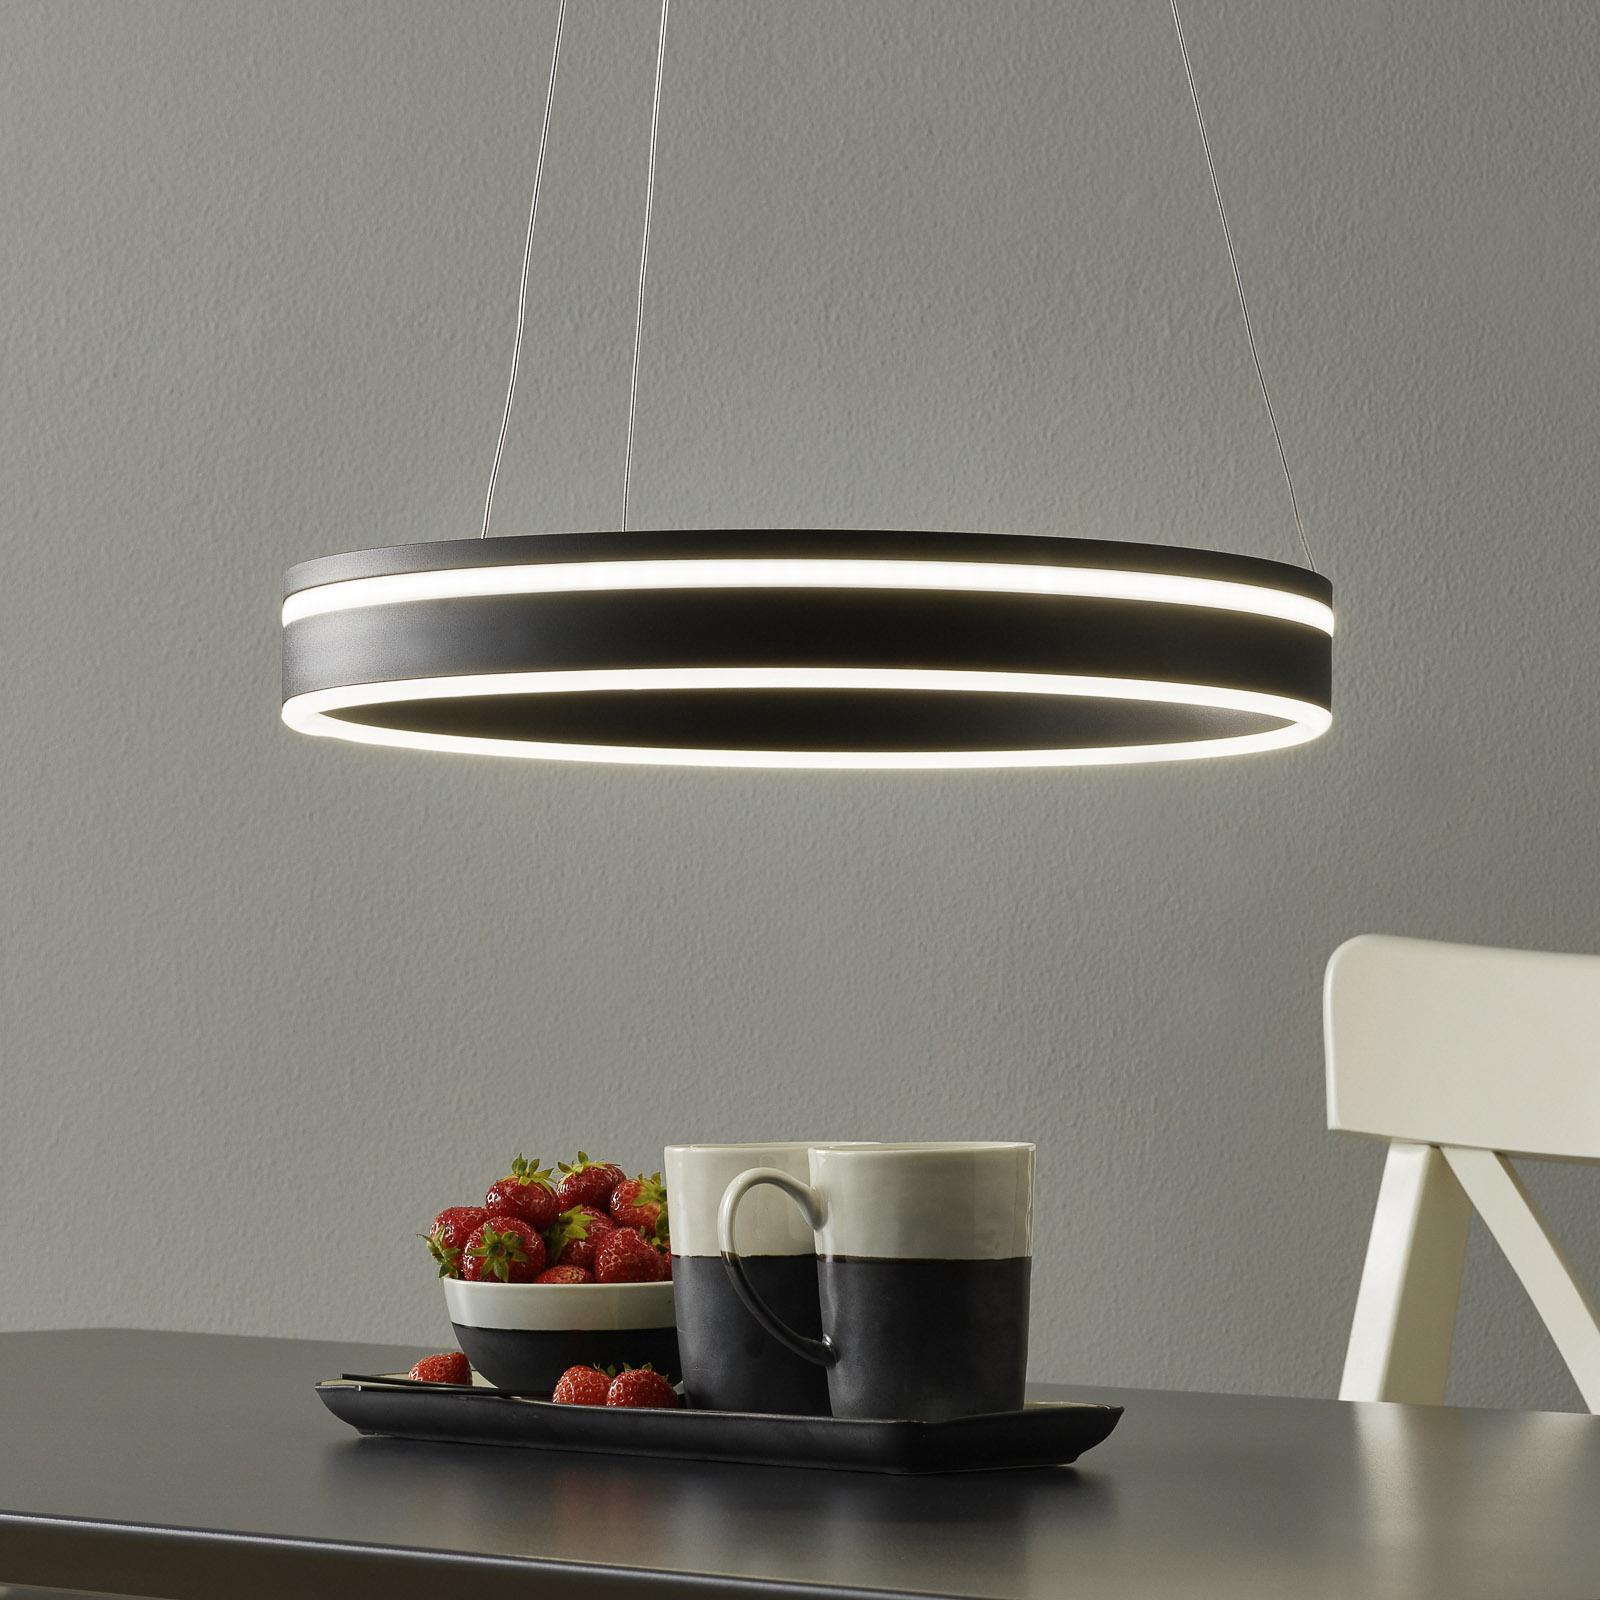 Paul Neuhaus Q-VITO LED hanglamp 40cm antraciet